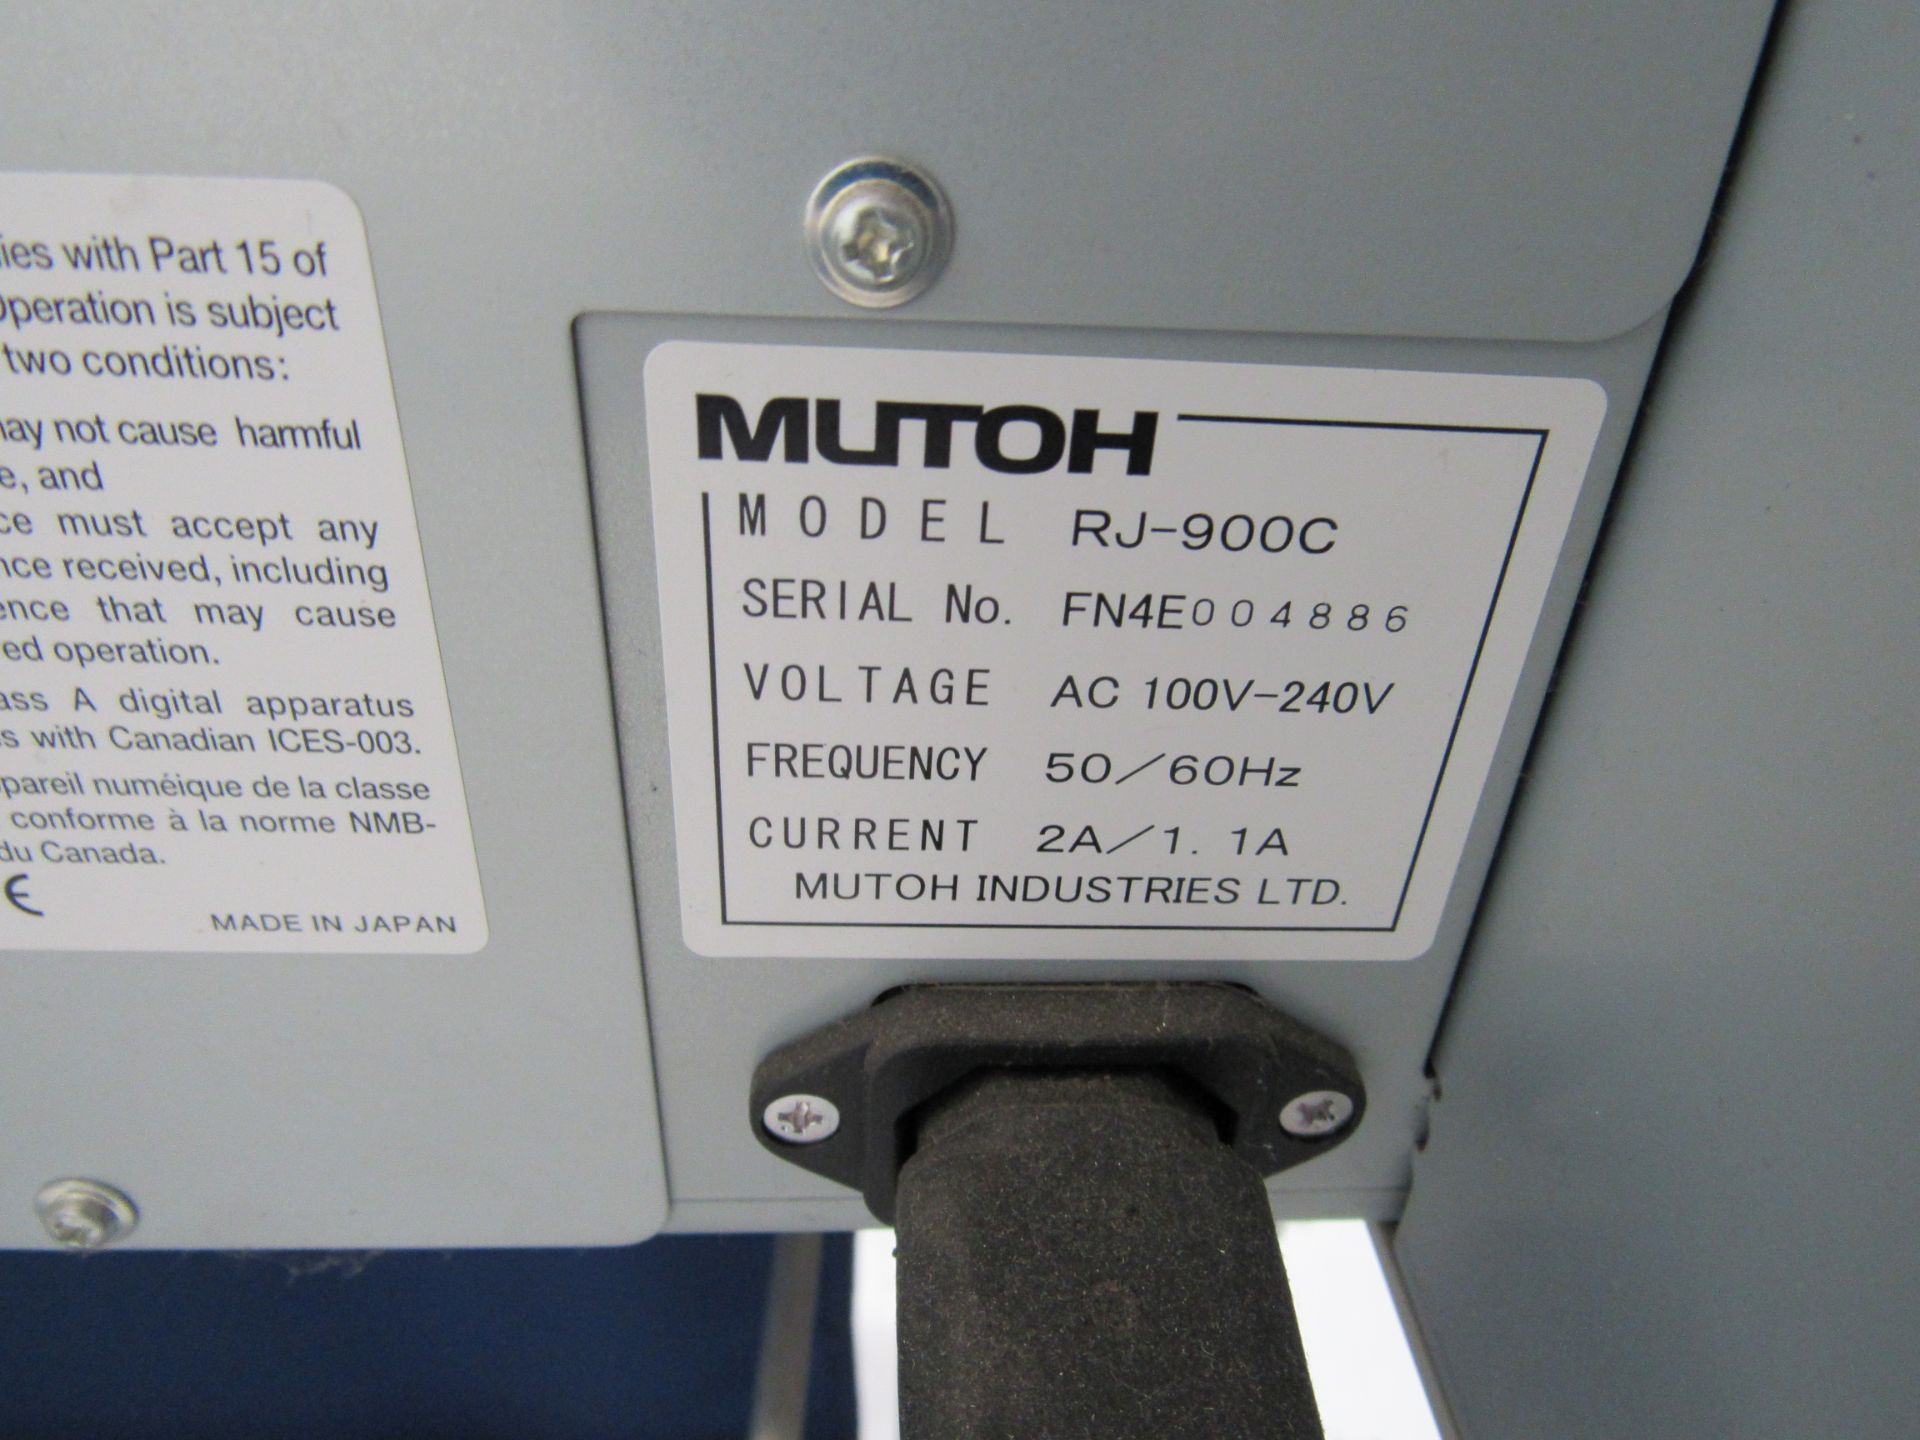 Mlitoh RJ-900C Wide Format Printer 1150mm Serial Number FN4E004886 - Image 5 of 5